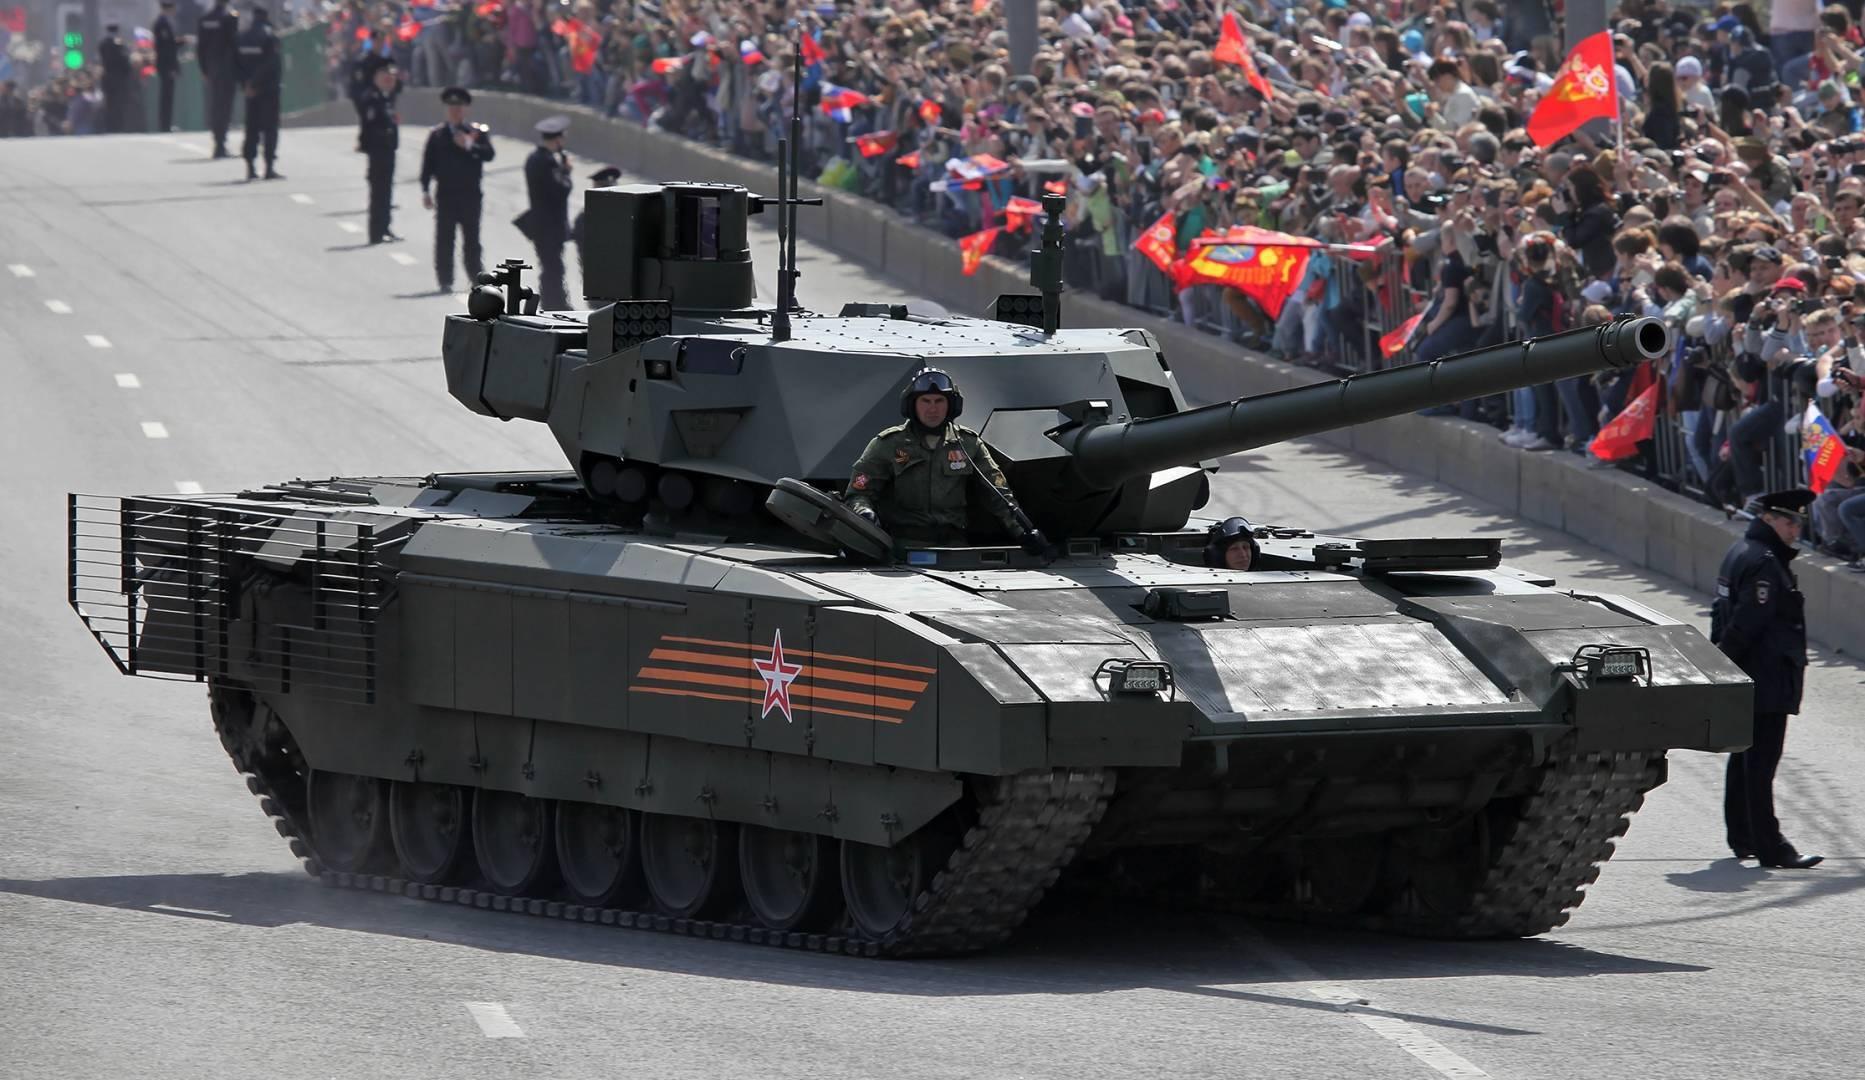 Лучшие танки «проекта армата». какая техника в игре — имба? — игромания